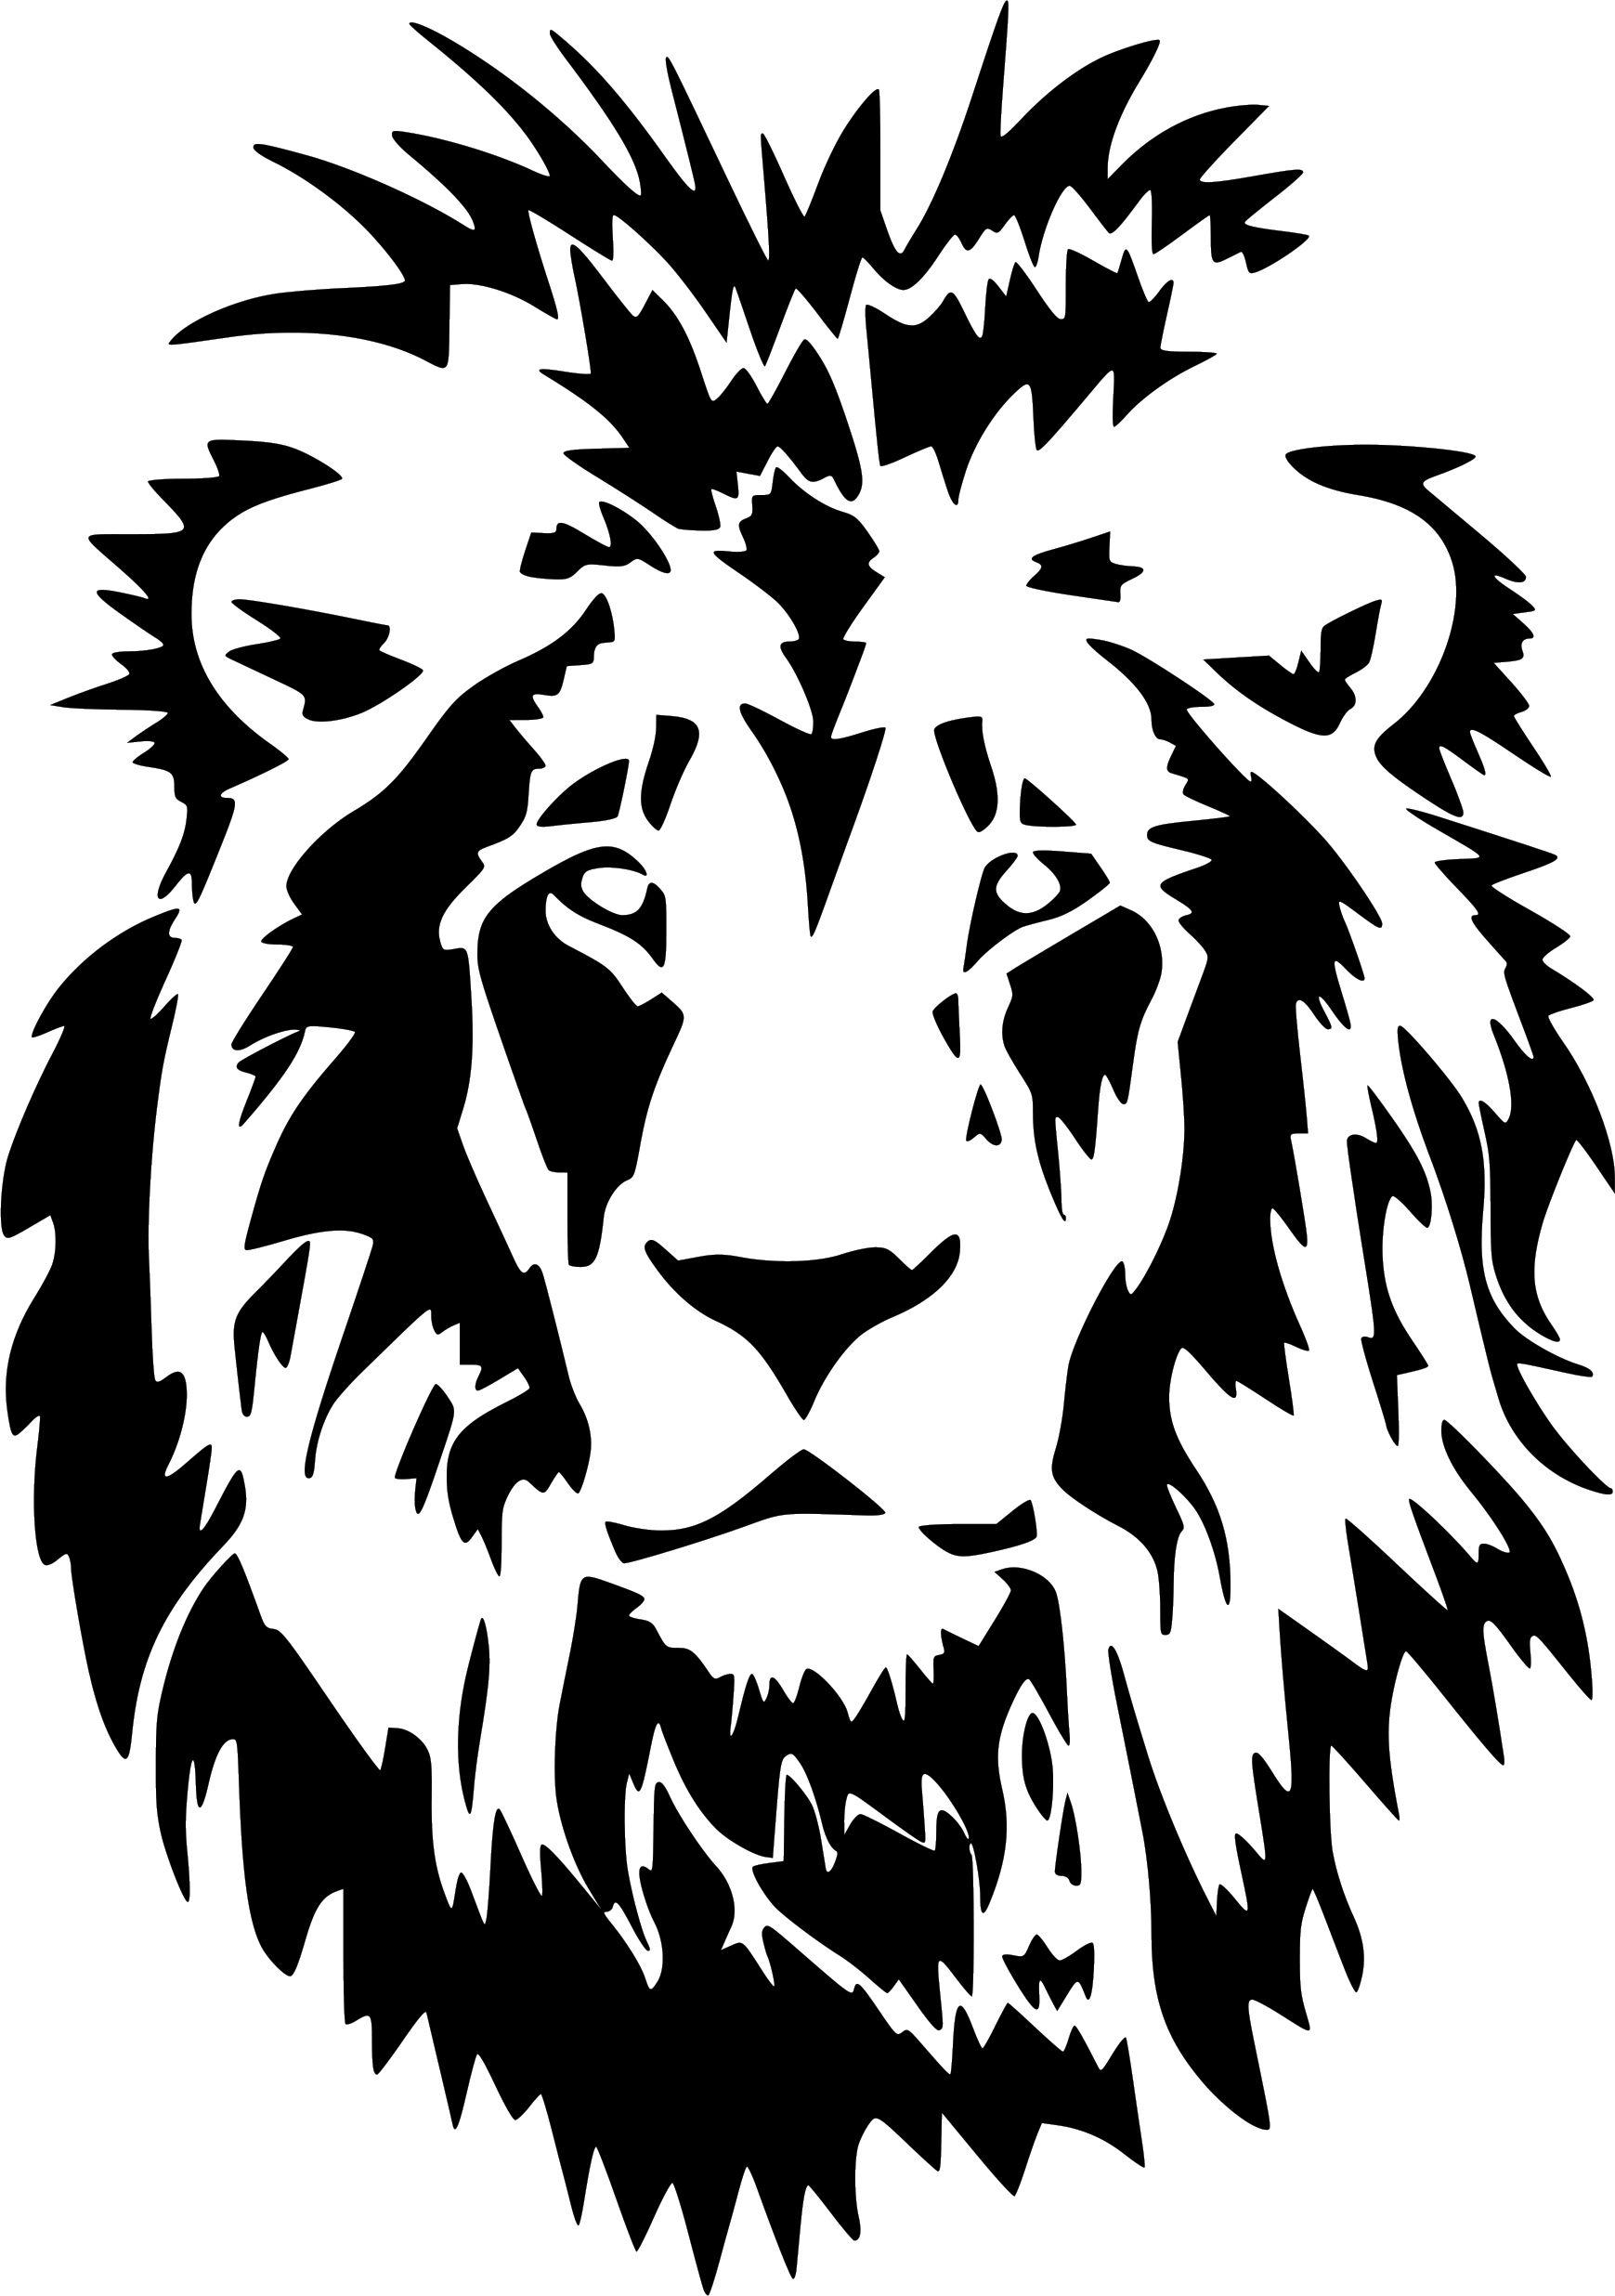 Lion Head Animal Art Graphic Vinyl Sticker Car Truck Wall Laptop ... 1a7ba4a61c